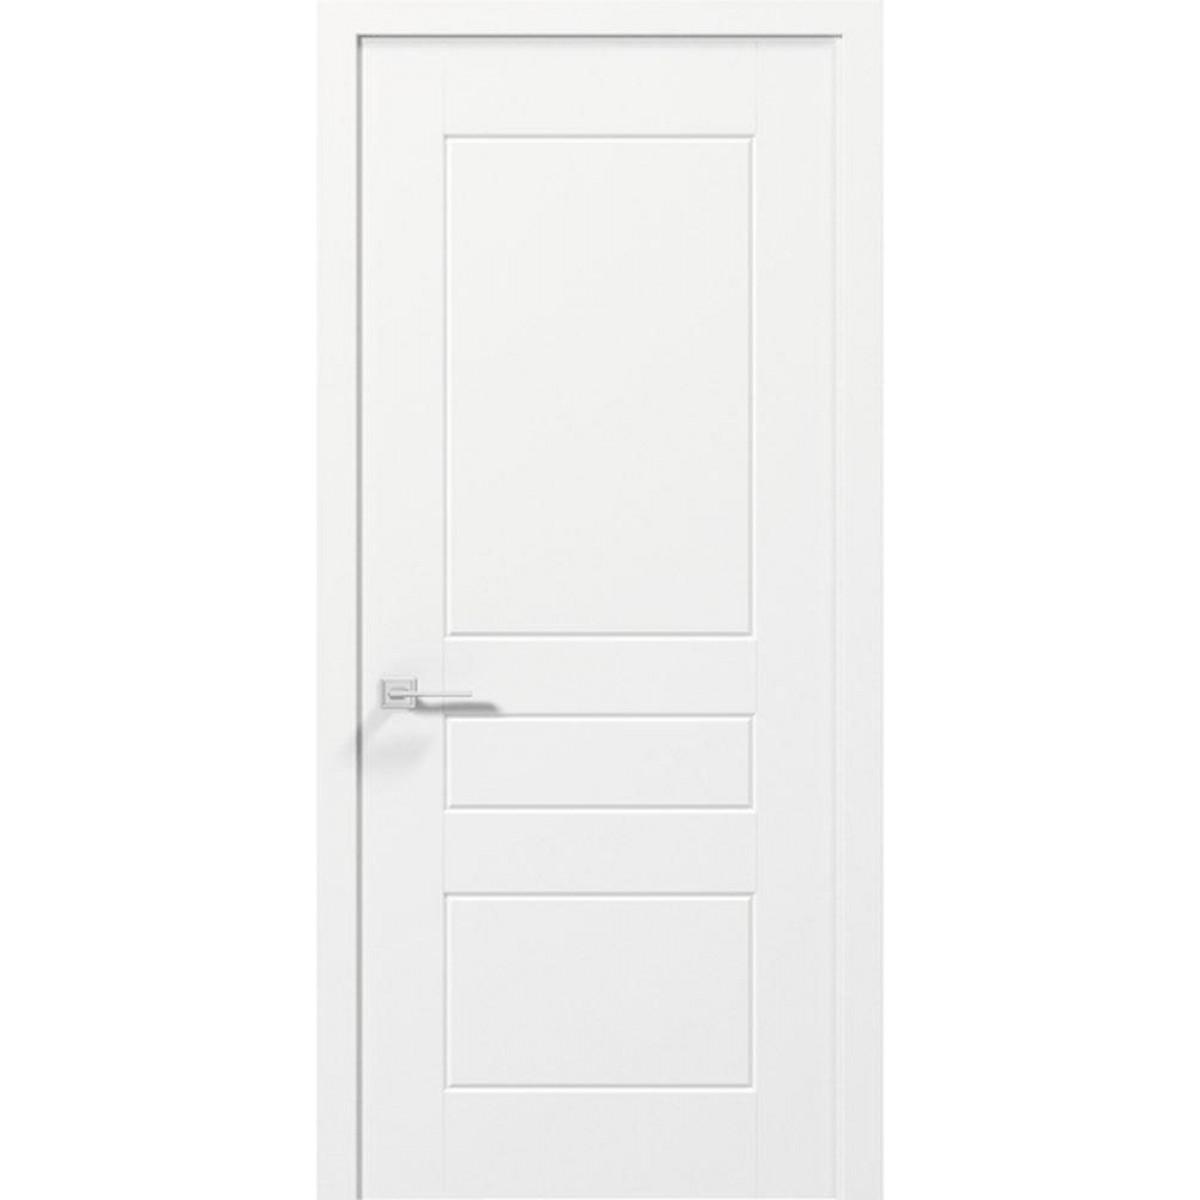 Межкомнатная дверь Cortes Salsa белый мат Rodos